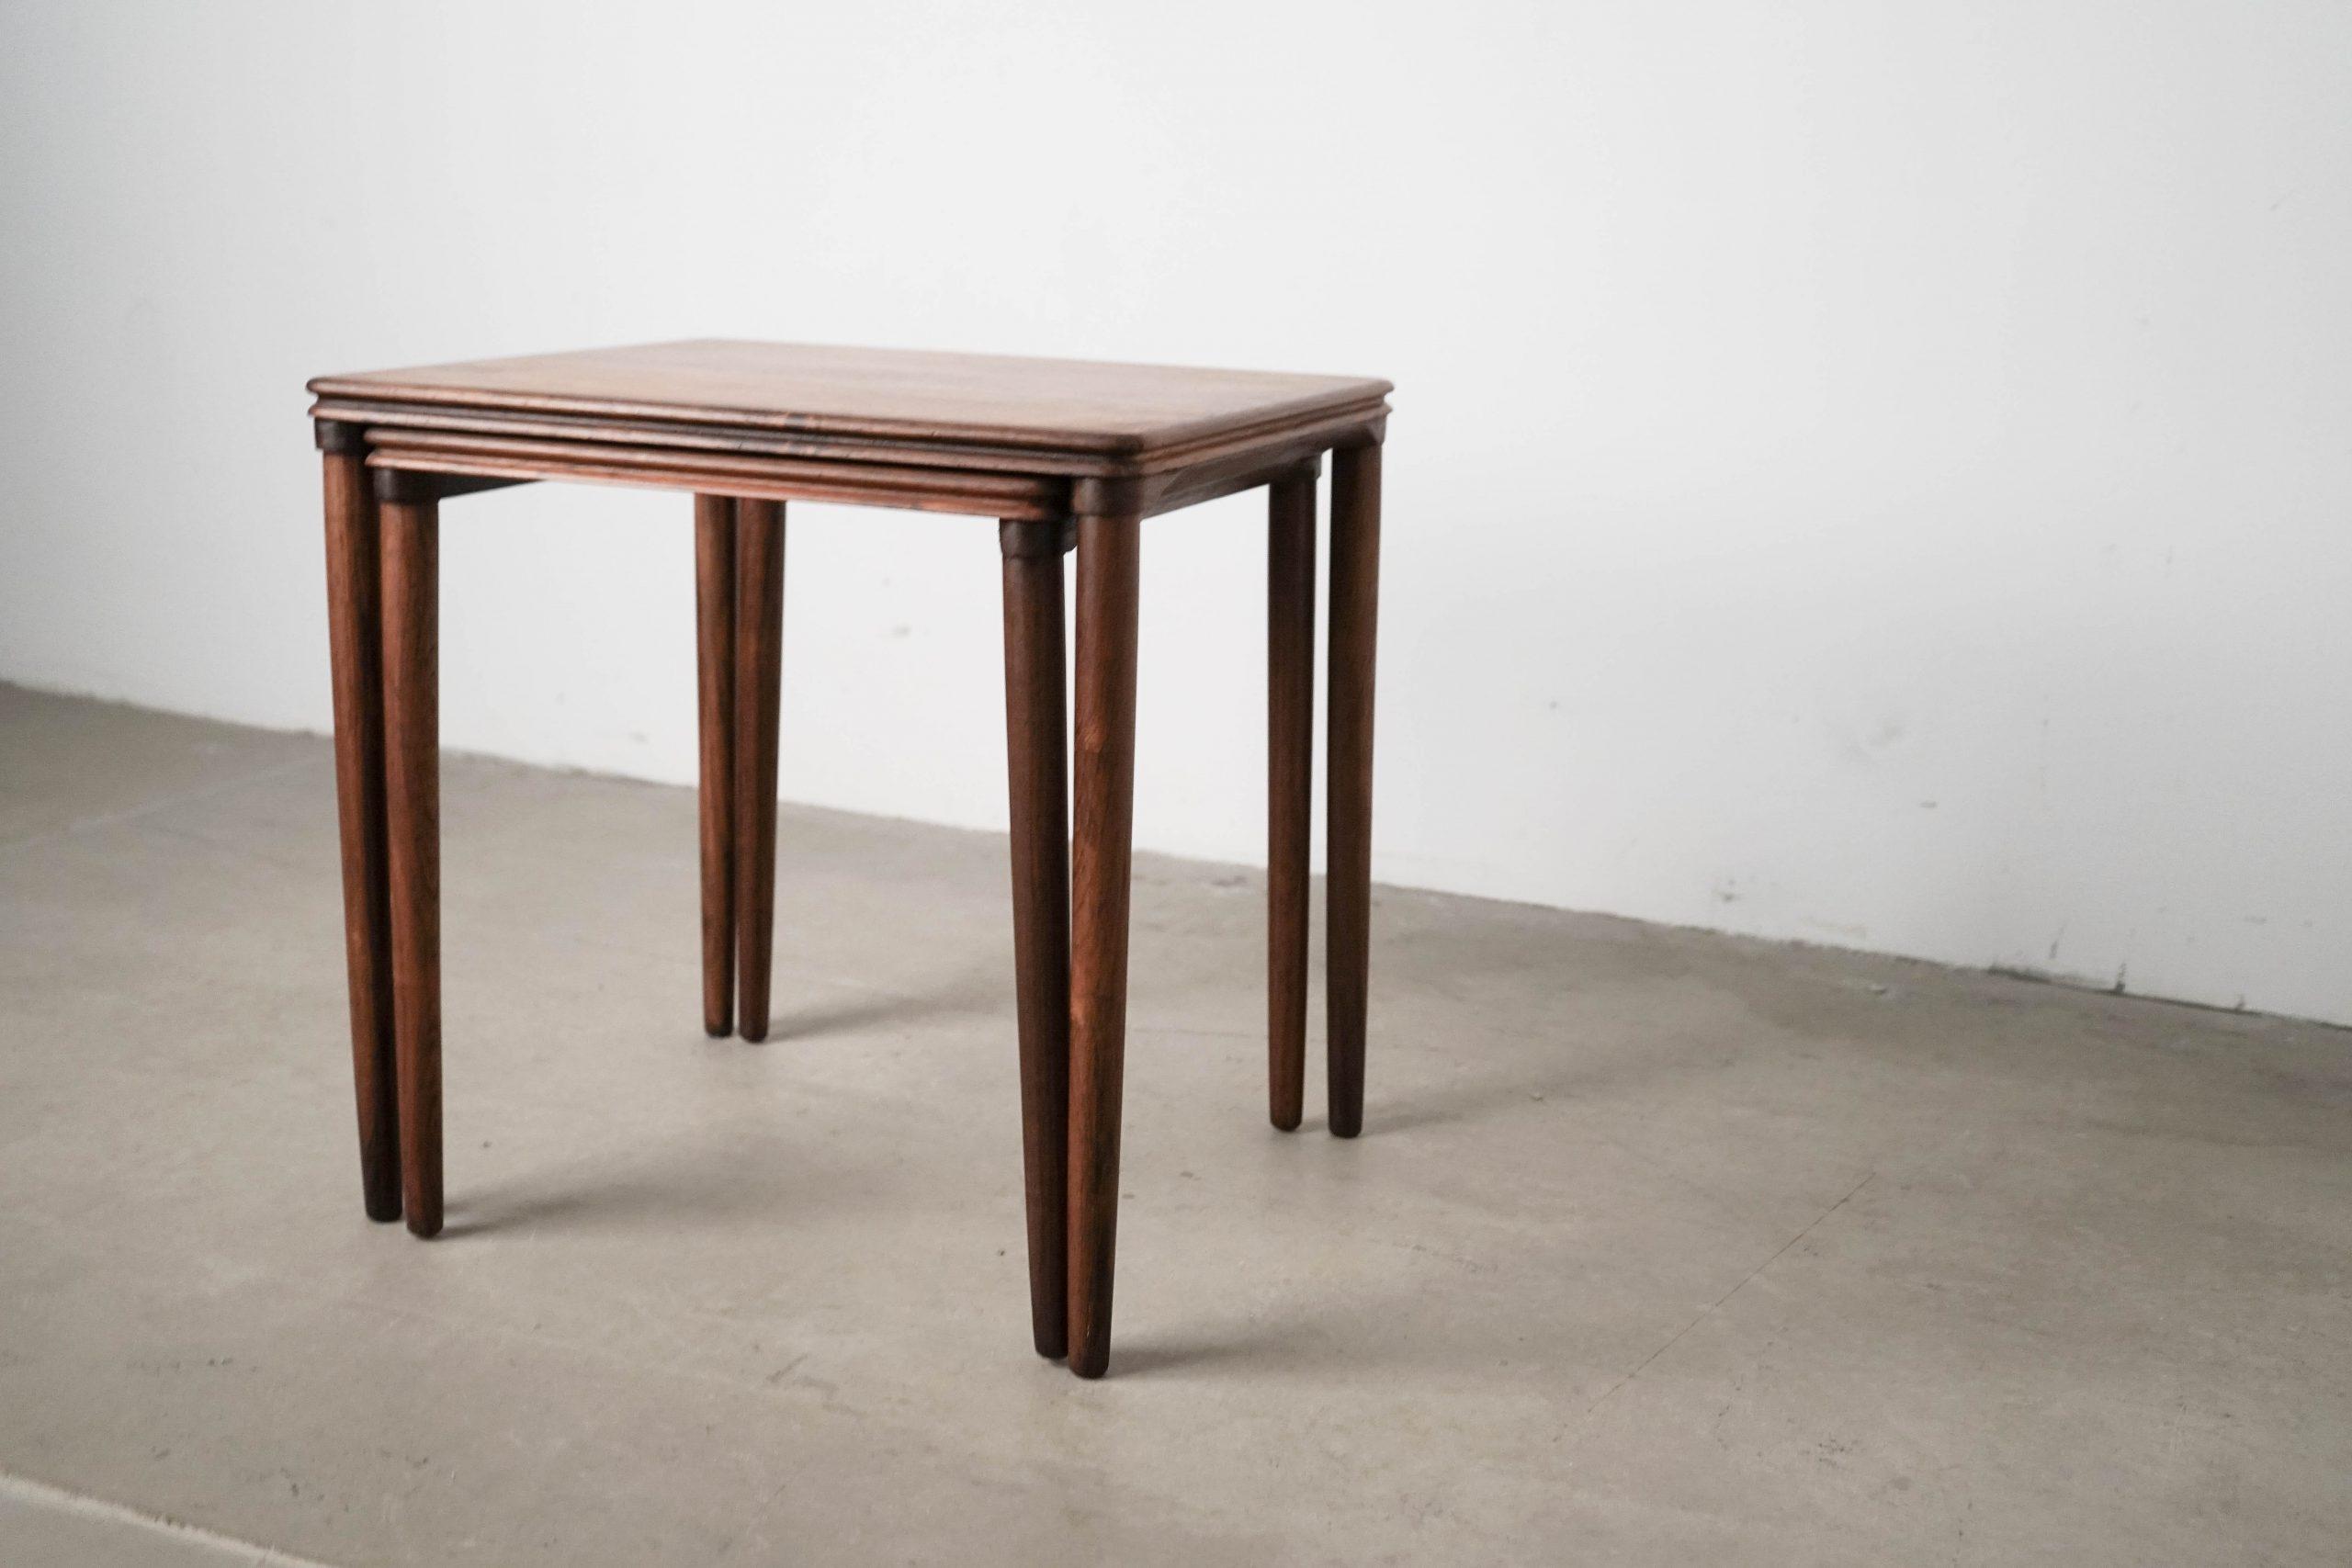 mesa de pata esbelta de diseño de madera